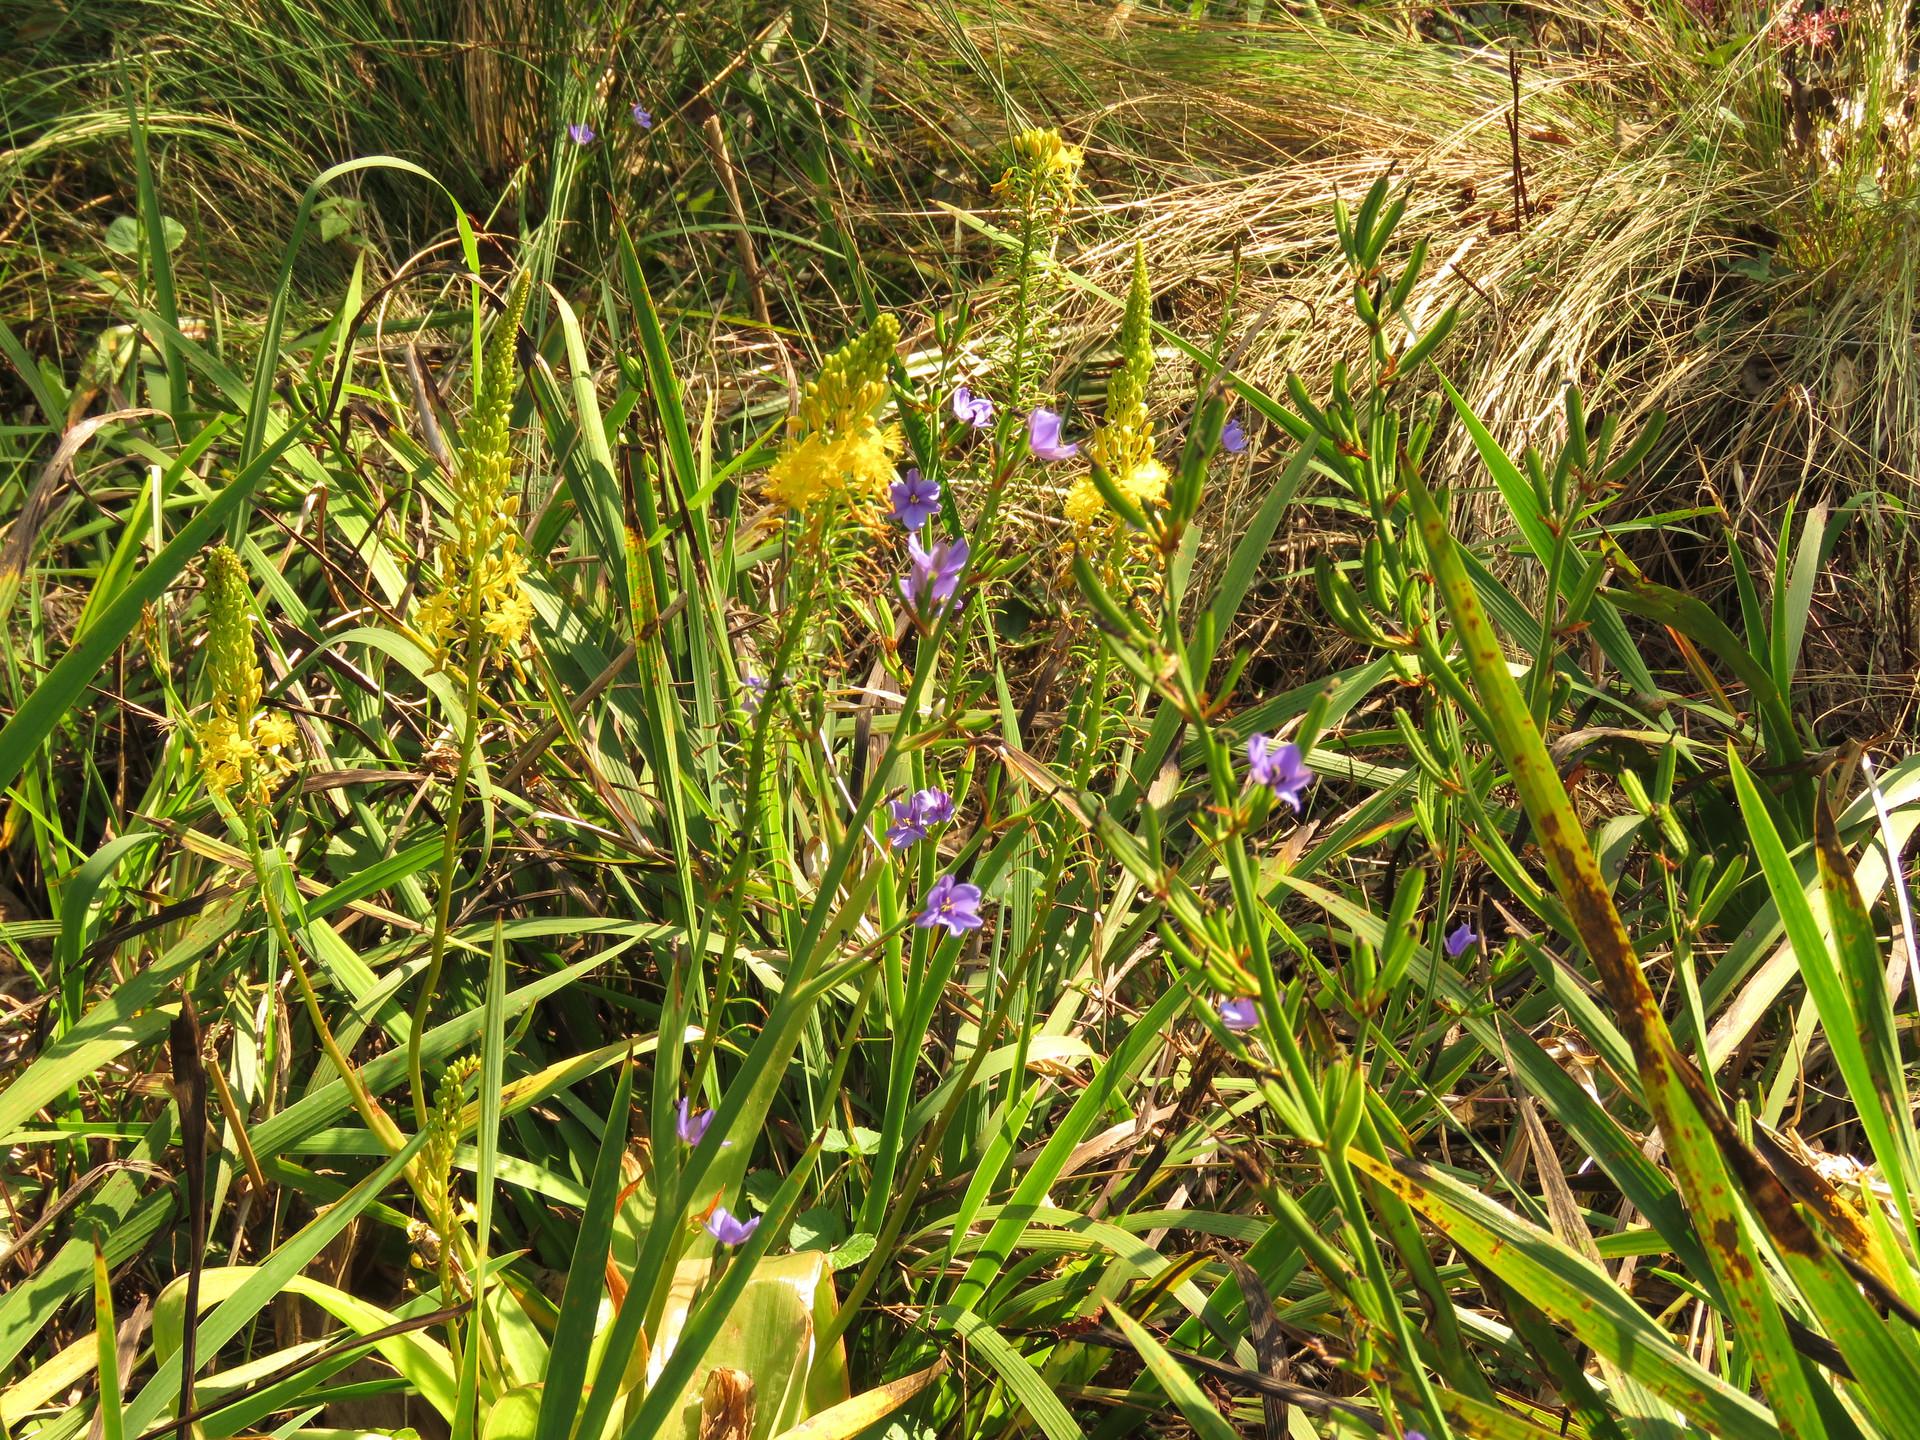 Aristea ecklonii and Bulbine latifolia